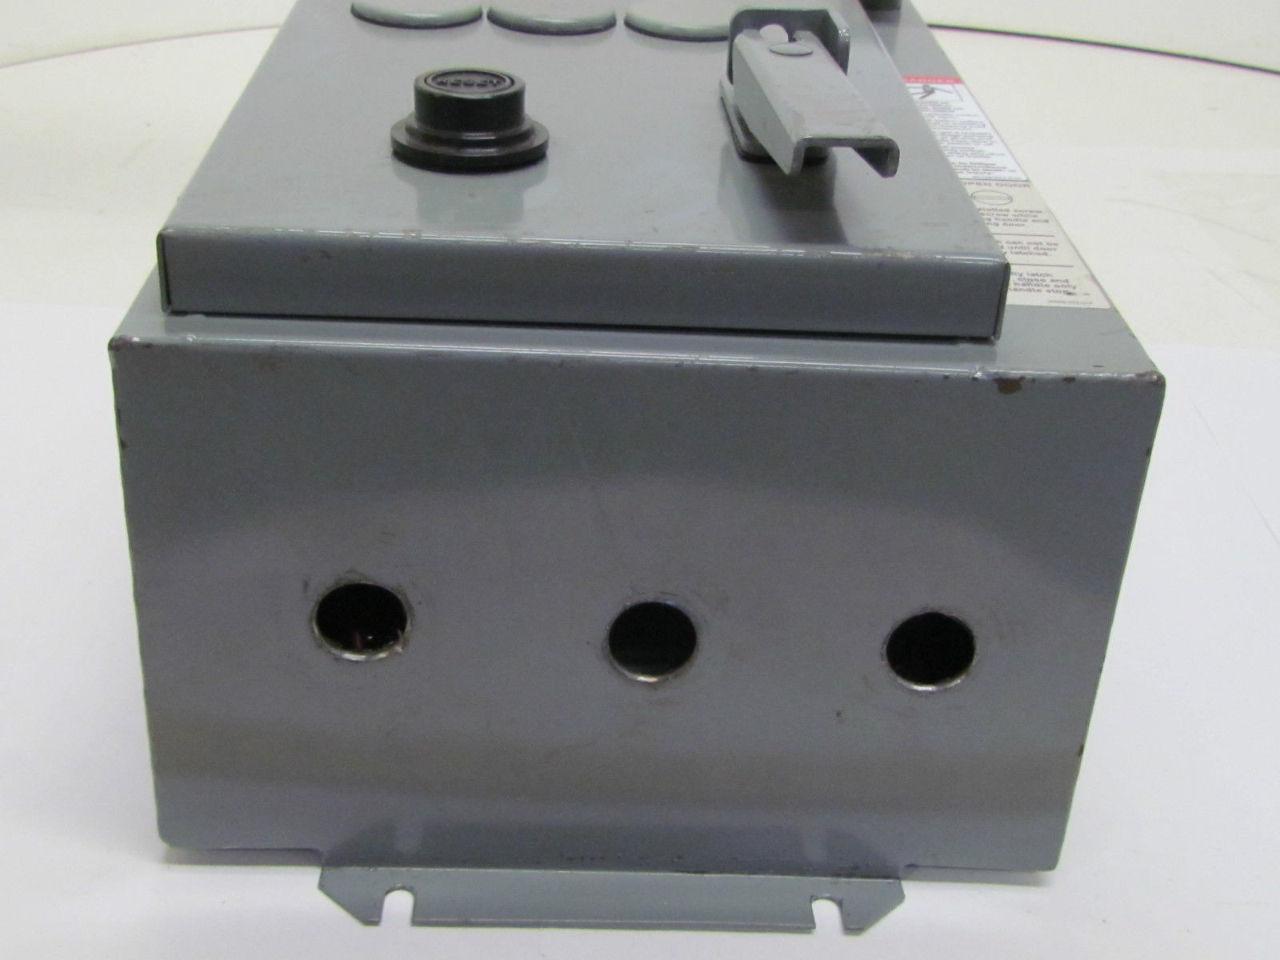 Square D 8538sca14v81f4t Size 1 Combination Motor Starter